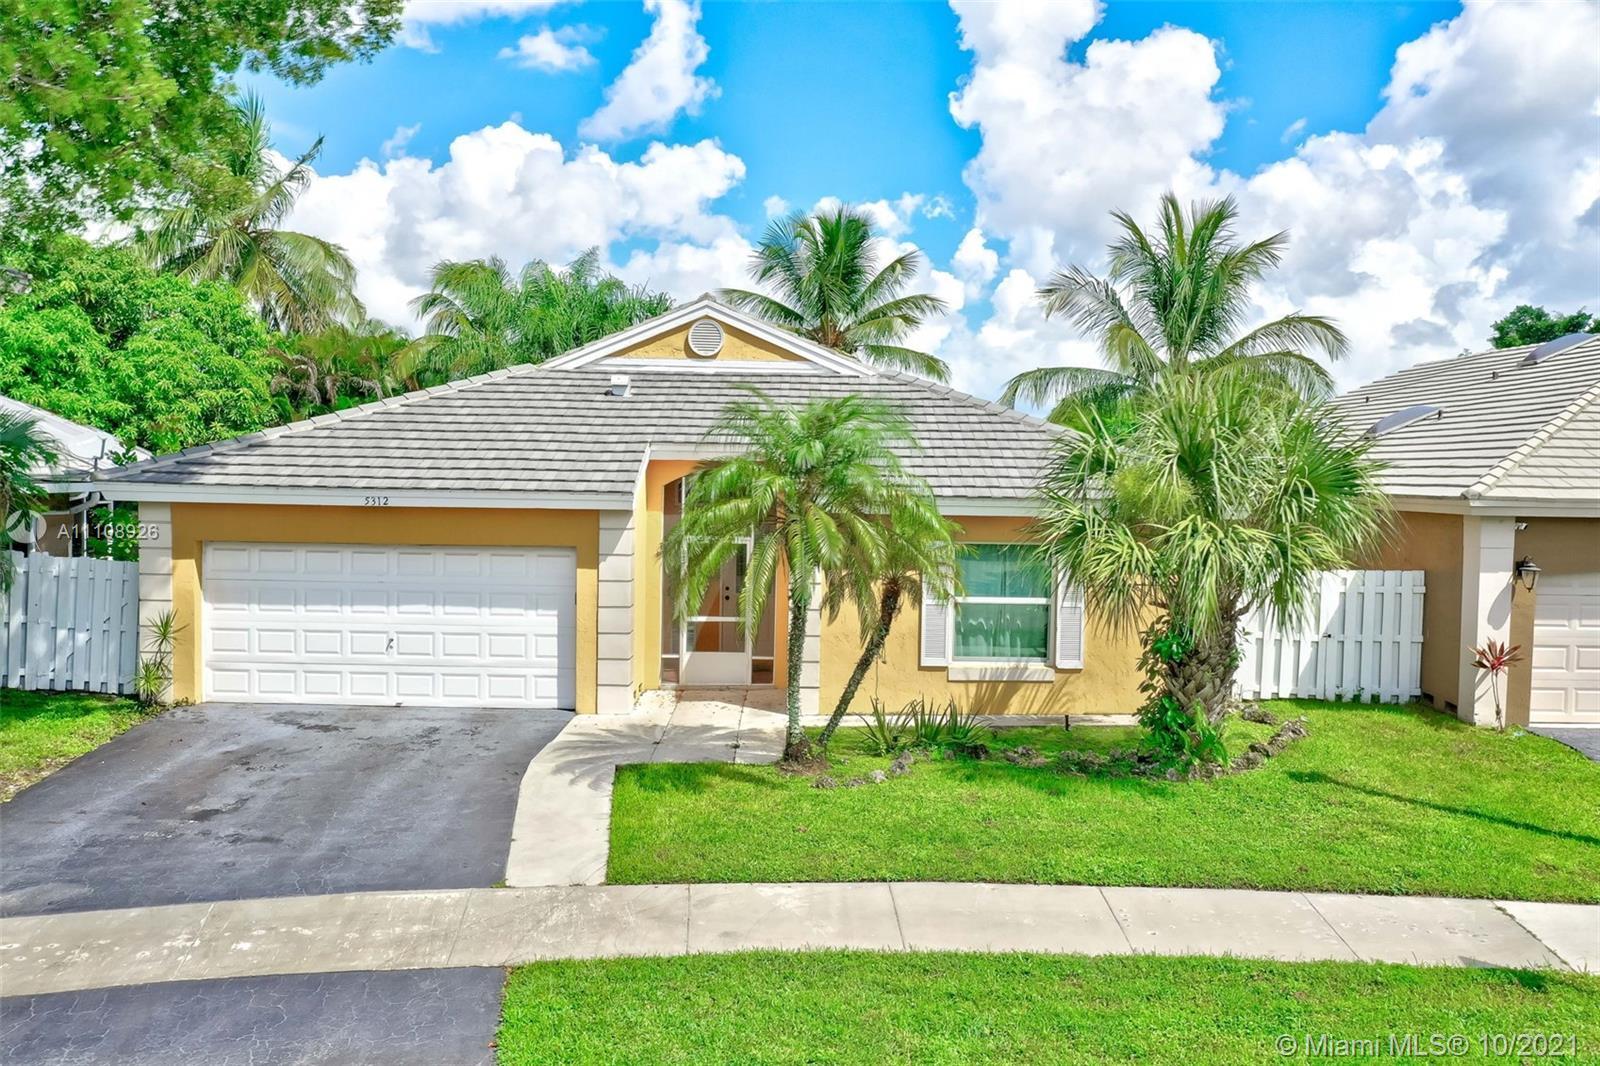 5312 55th Ter, Coconut Creek, Florida 33073